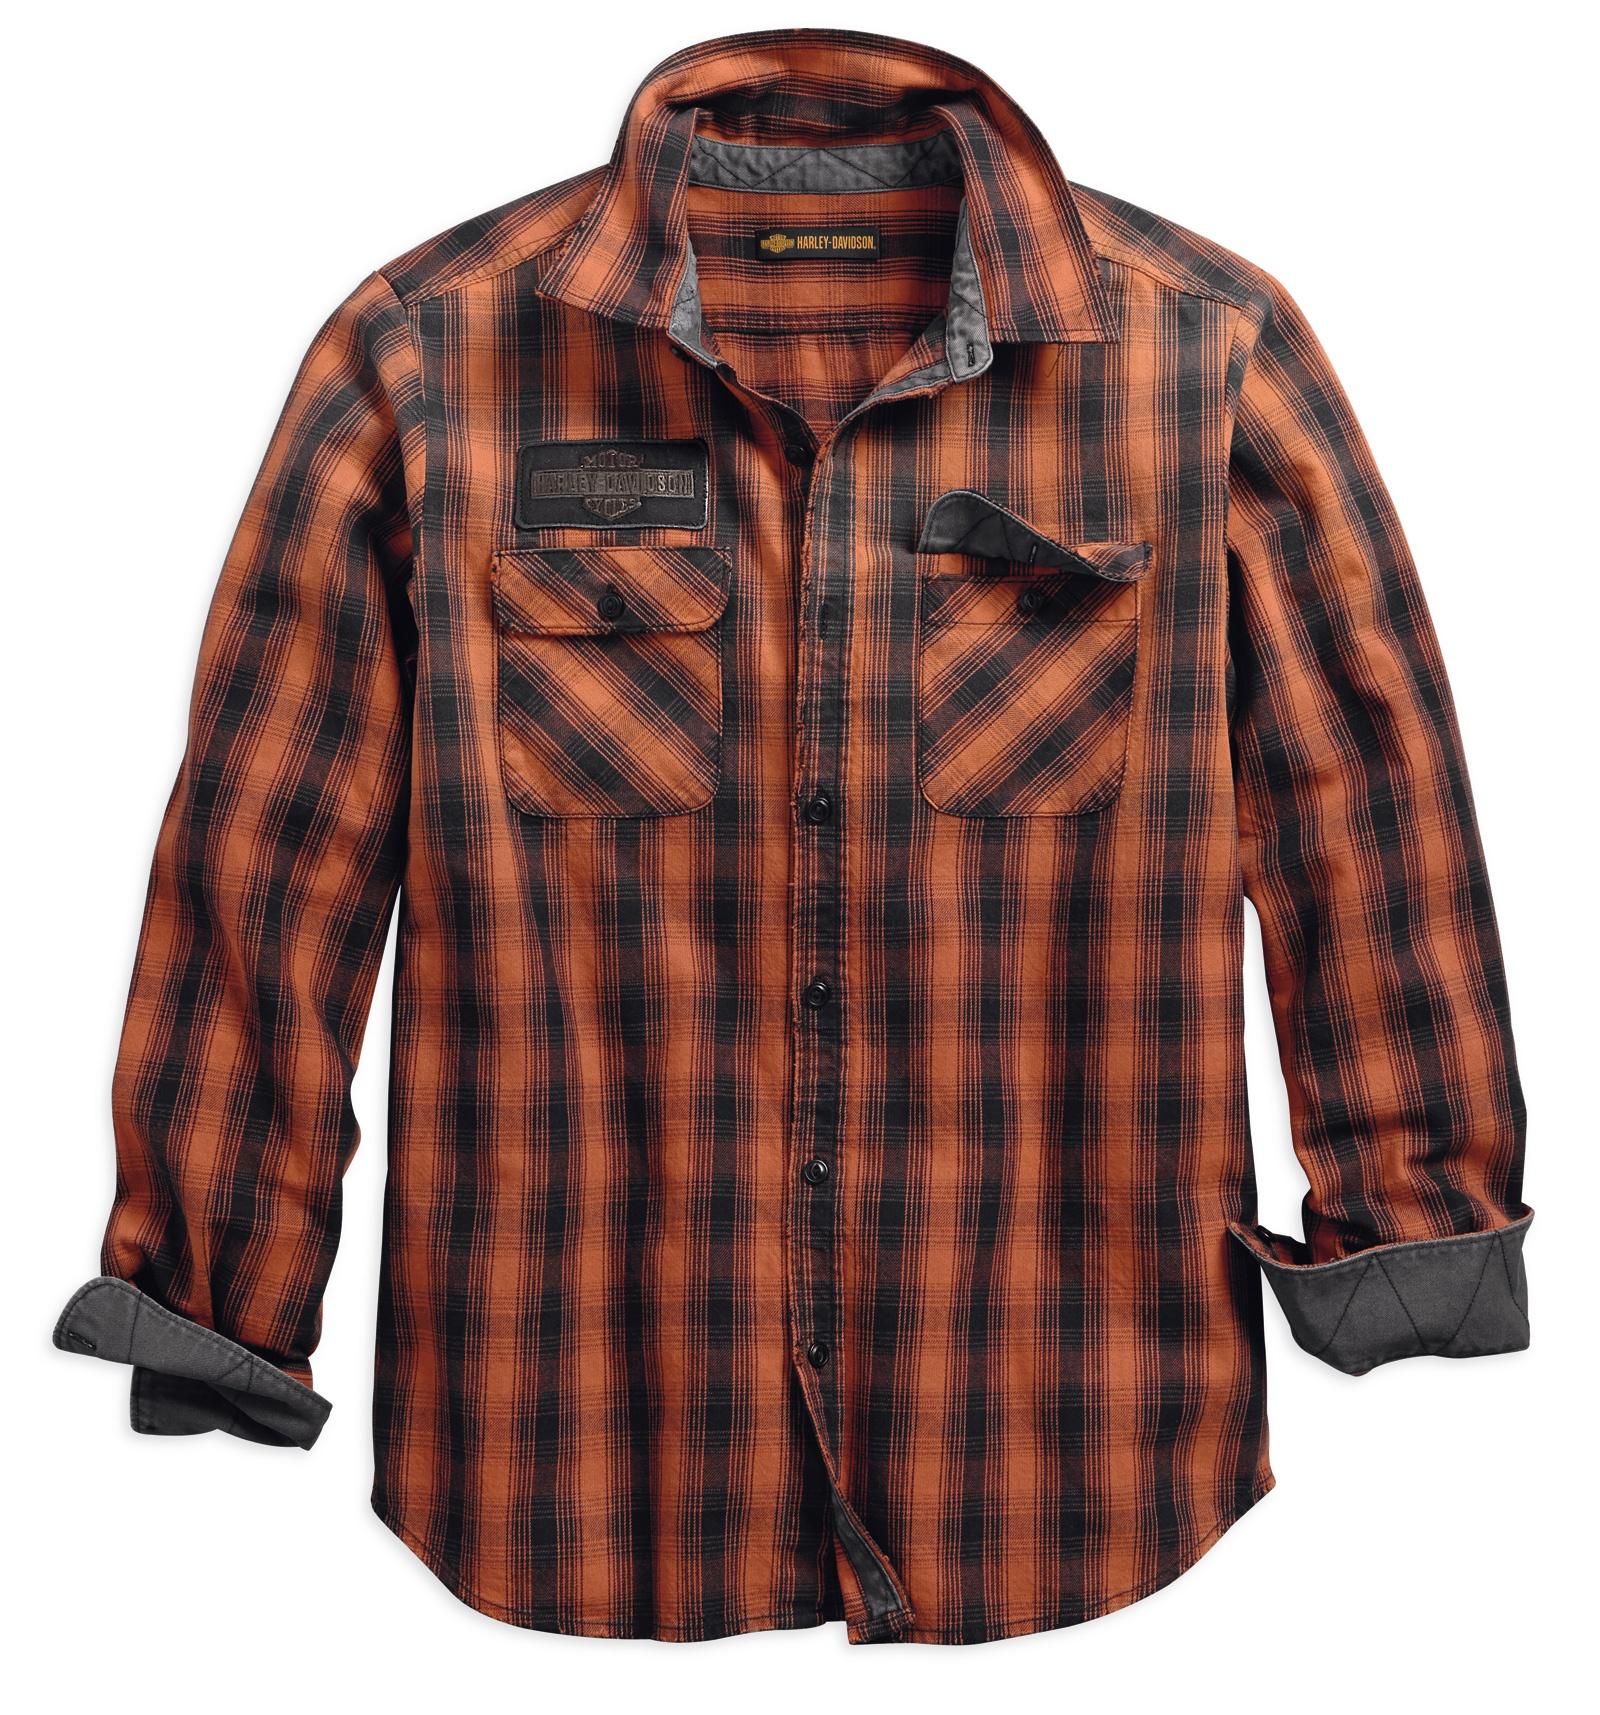 d74db6c382282b Harley-Davidson Hemden online kaufen im Thunderbike Shop